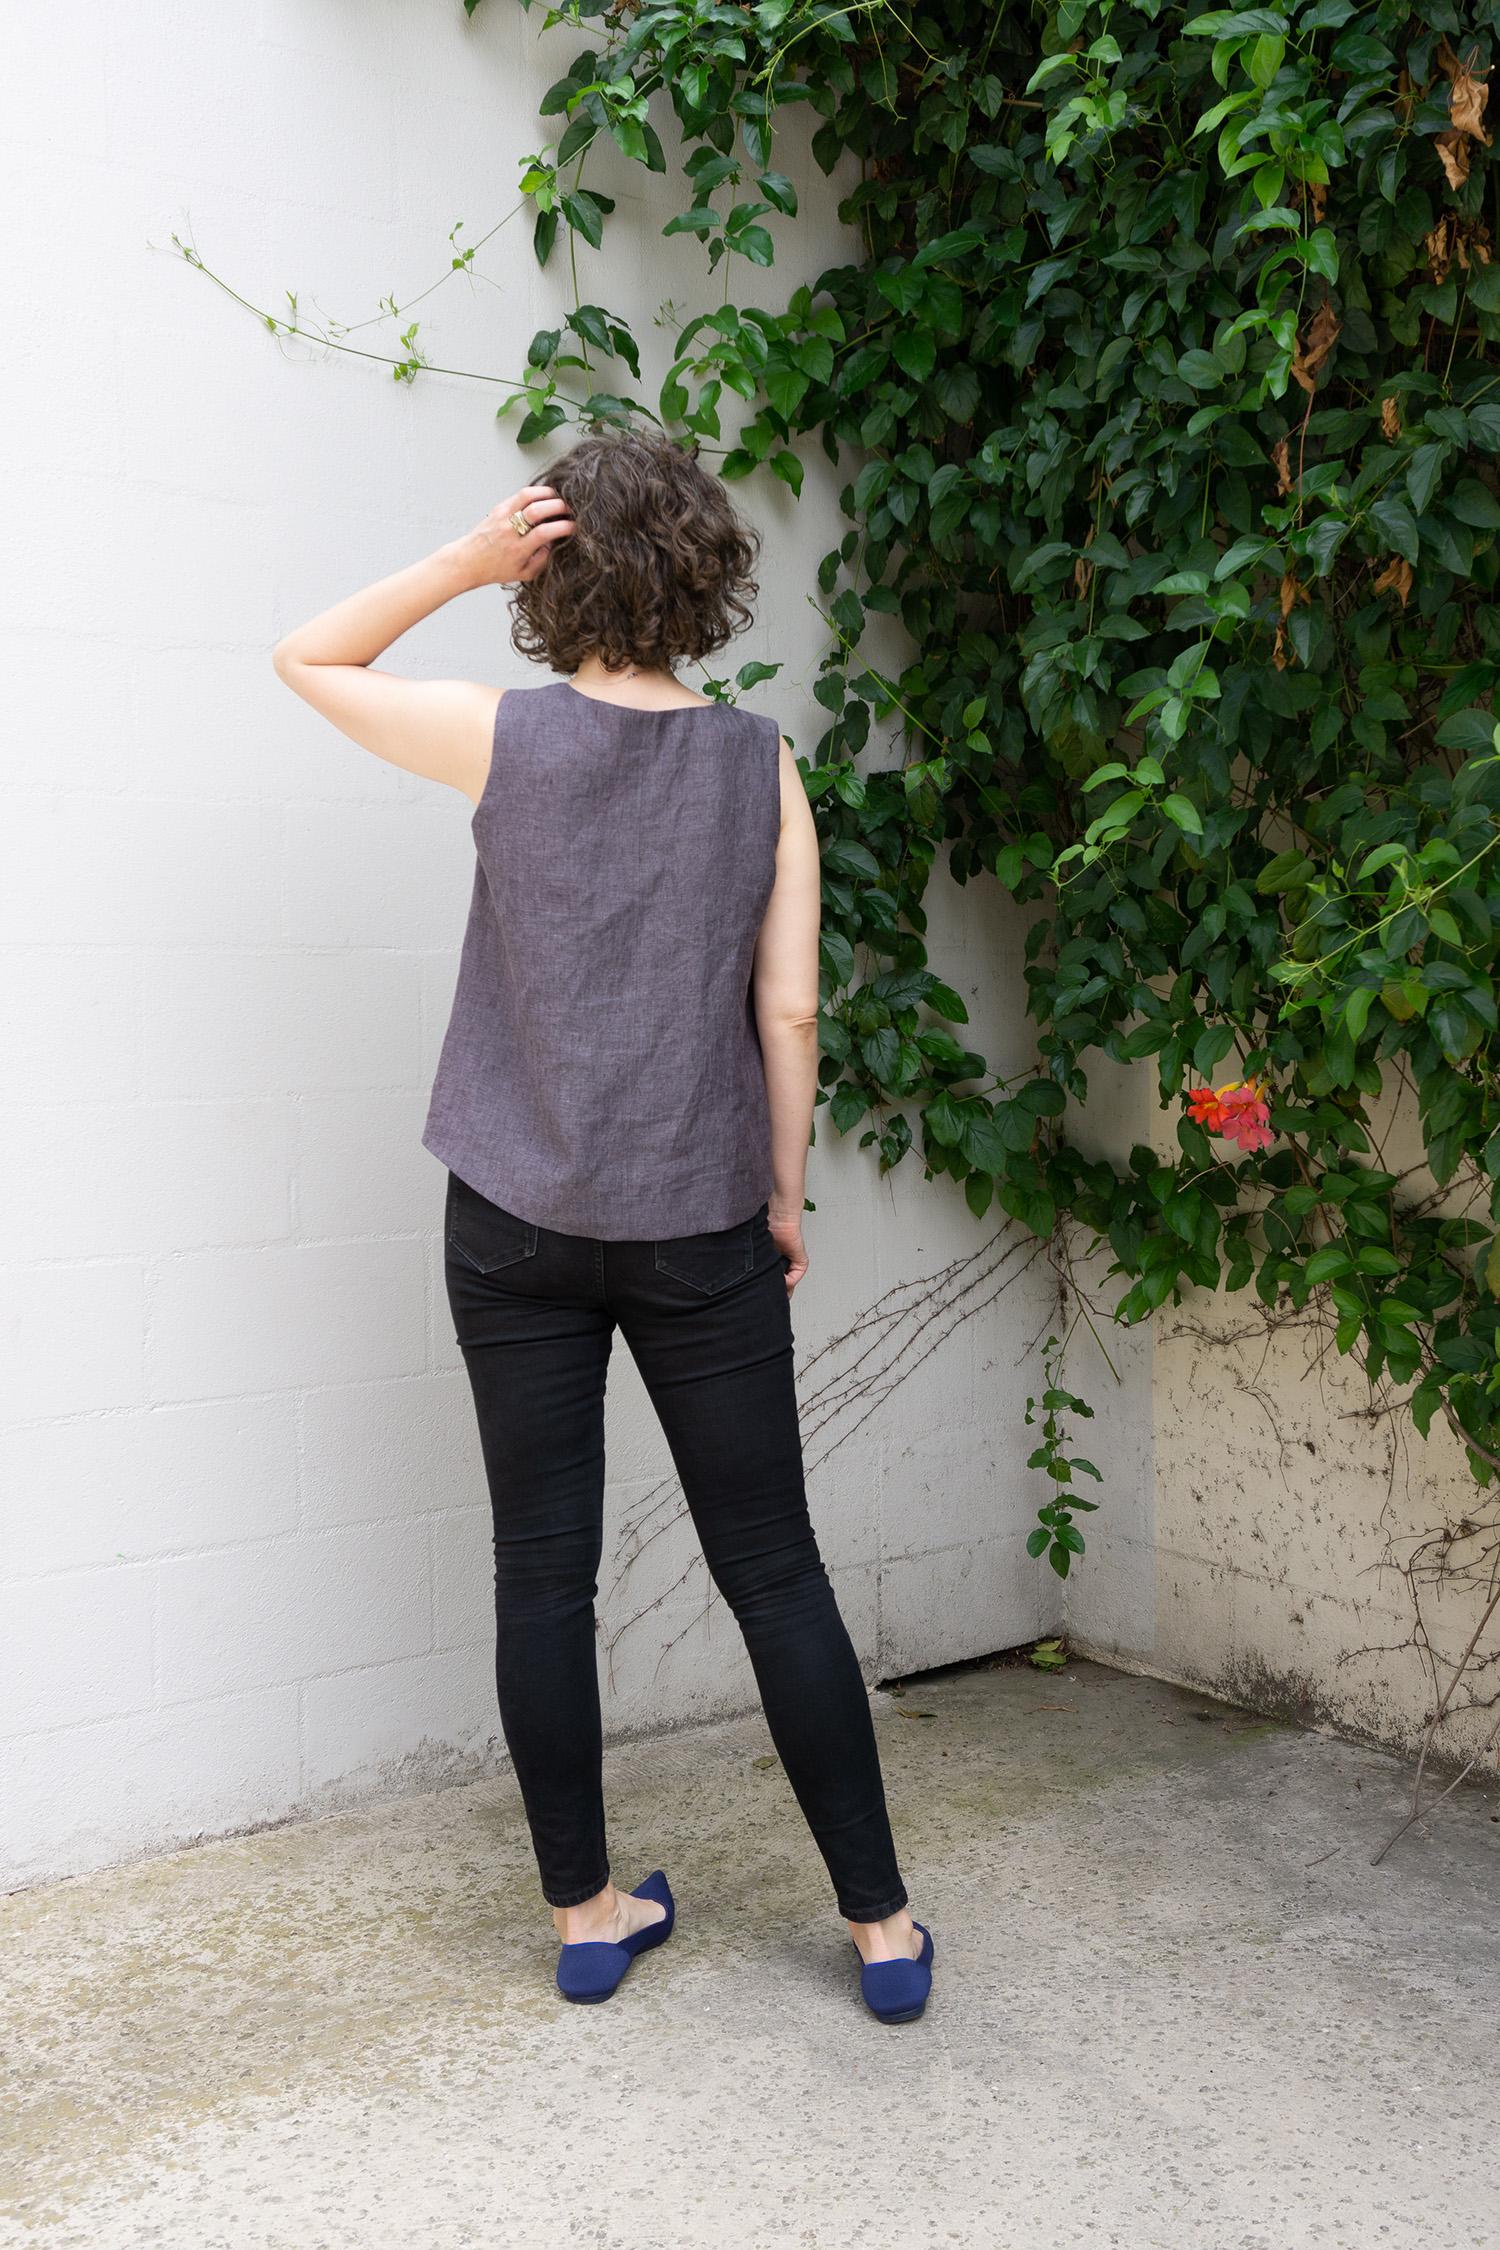 DIY Linen Swing Tank - Review of the Hadley Top pattern by Grainline Studio - Sew DIY